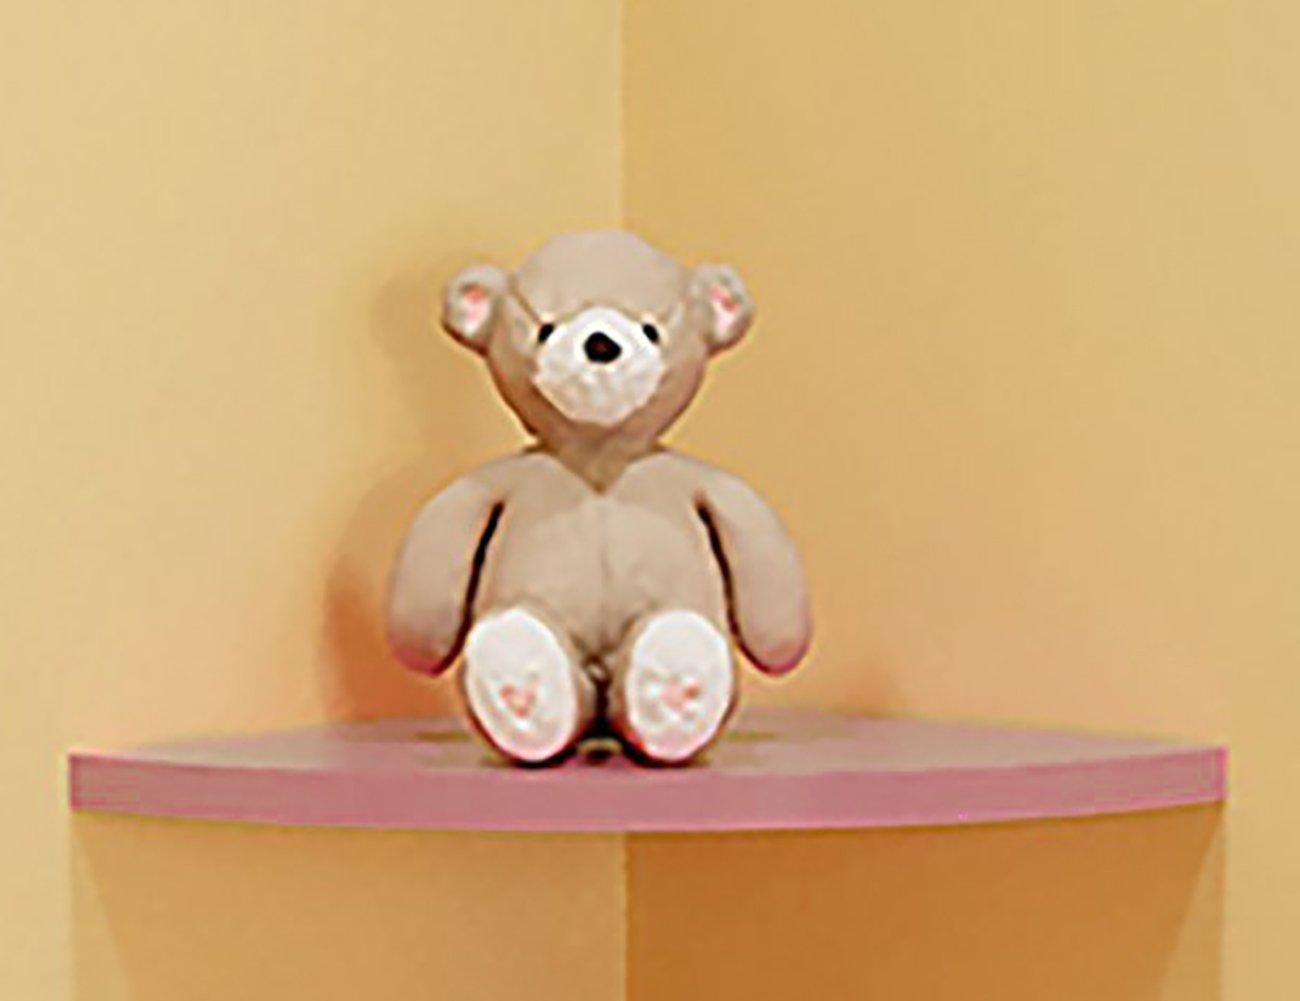 THEE Floating Corner Shelf Decorative Wall Storage Shelves for Bedroom Living Room